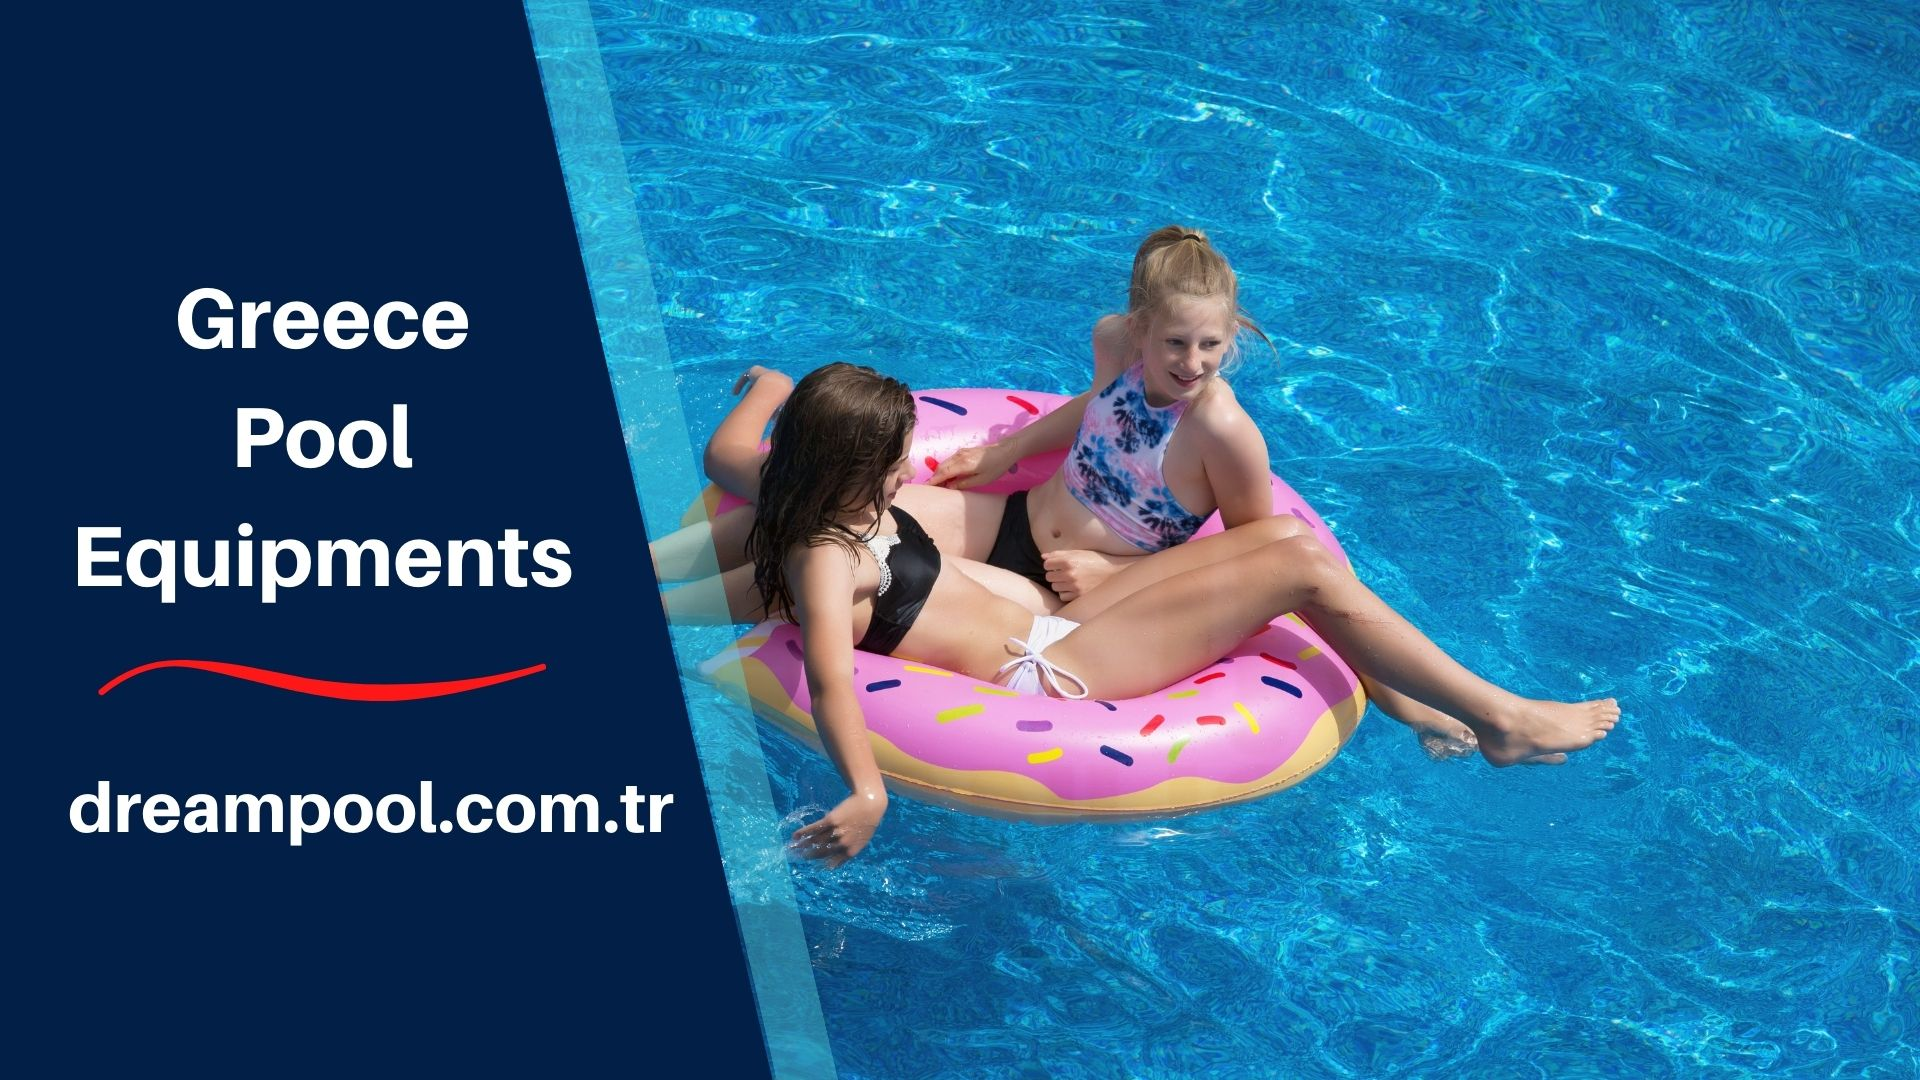 greece-pool-equipments